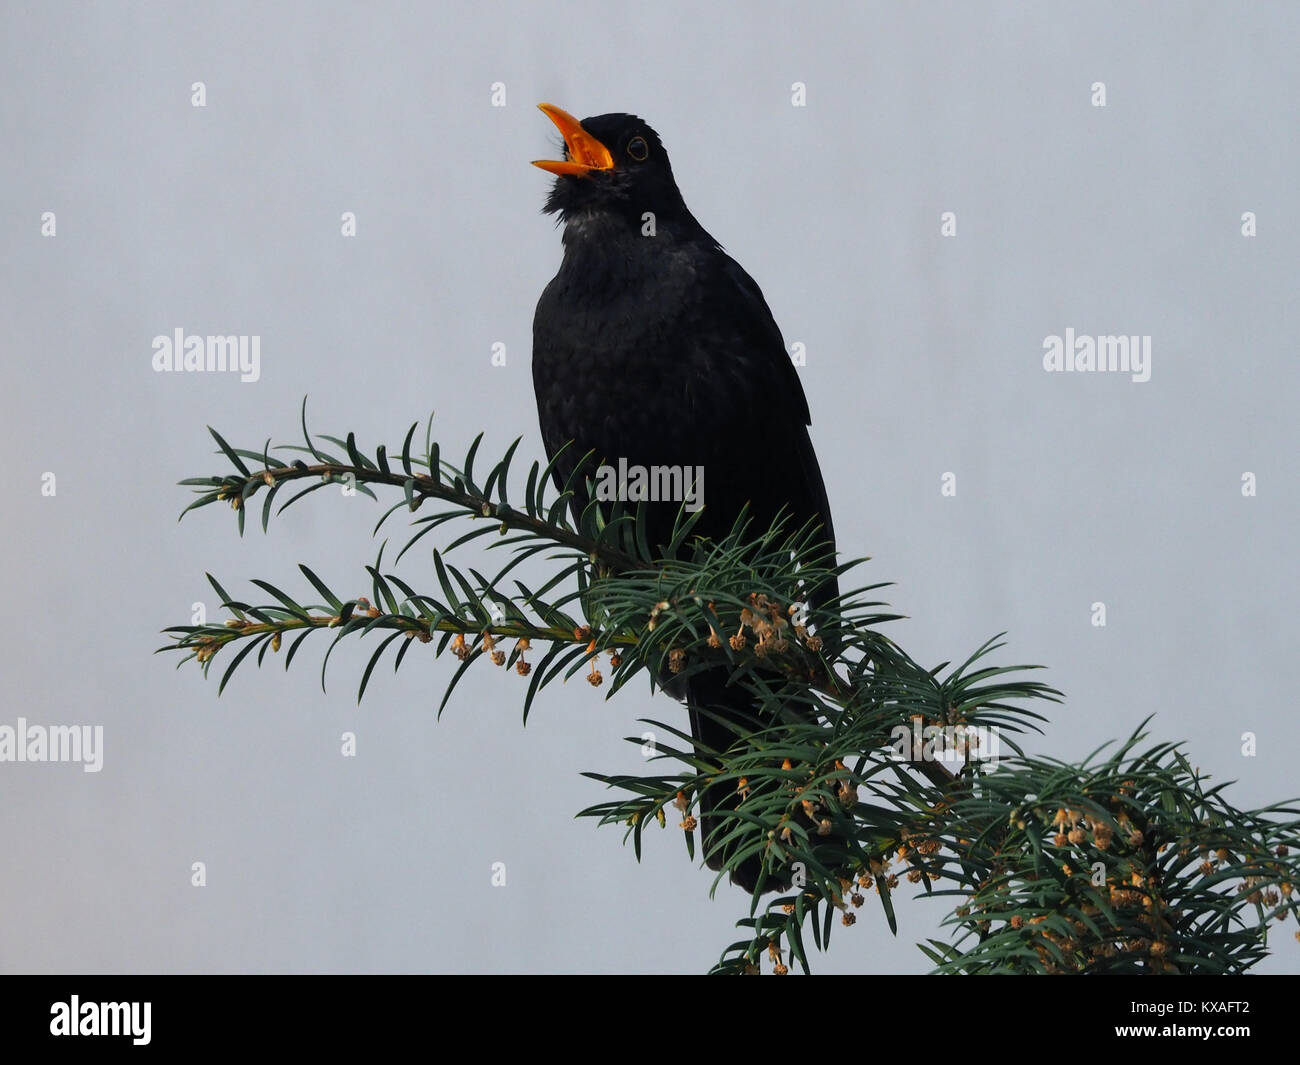 Blackbird (Turdus merula) sings with open beak on a branch,Leoben,Styria,Austria Stock Photo